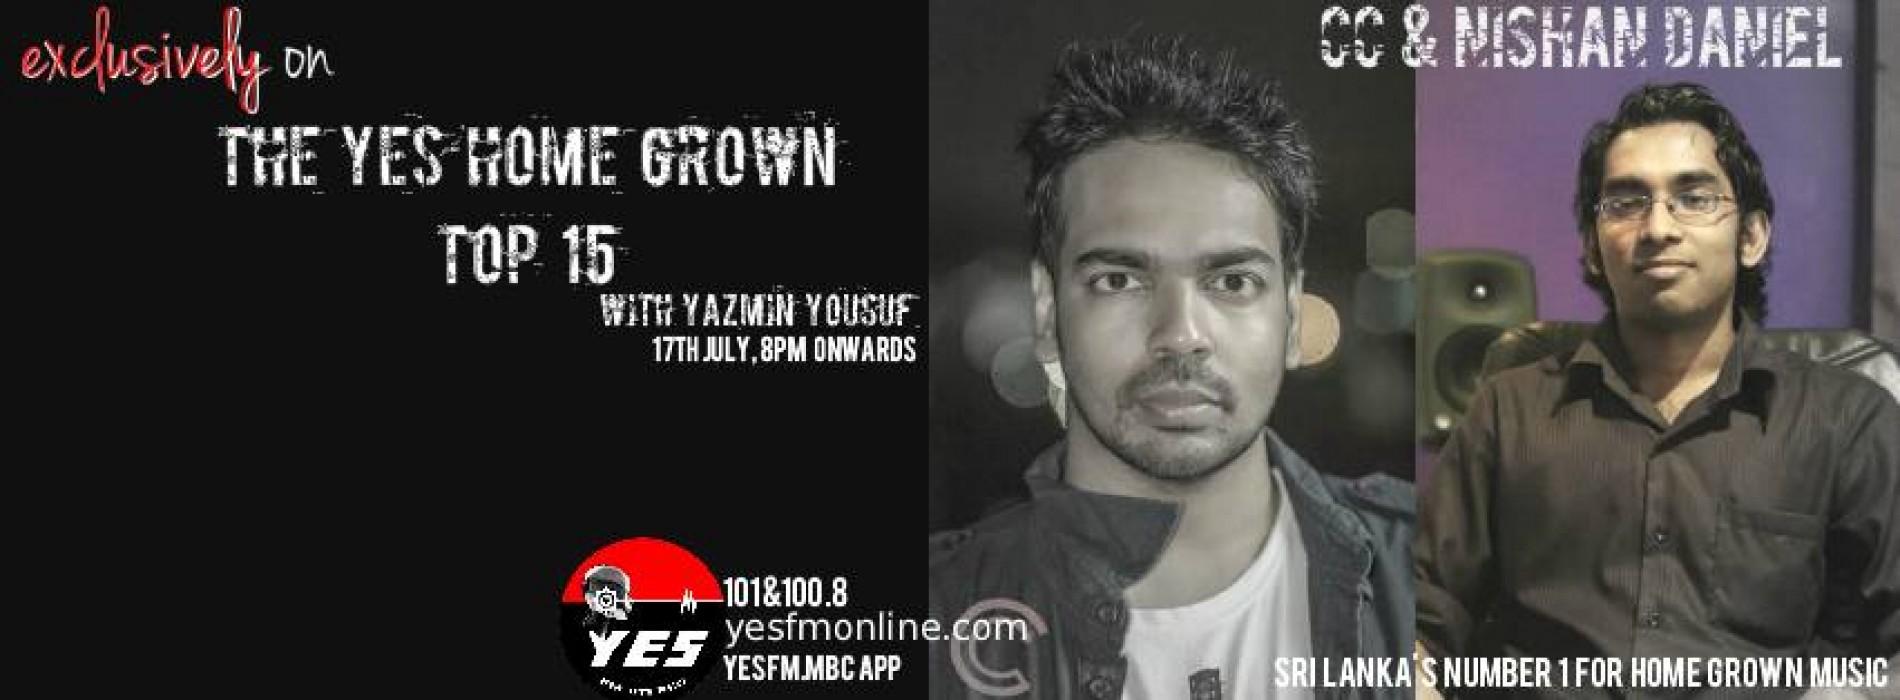 CC & Nishan Daniel On The YES Home Grown Top 15